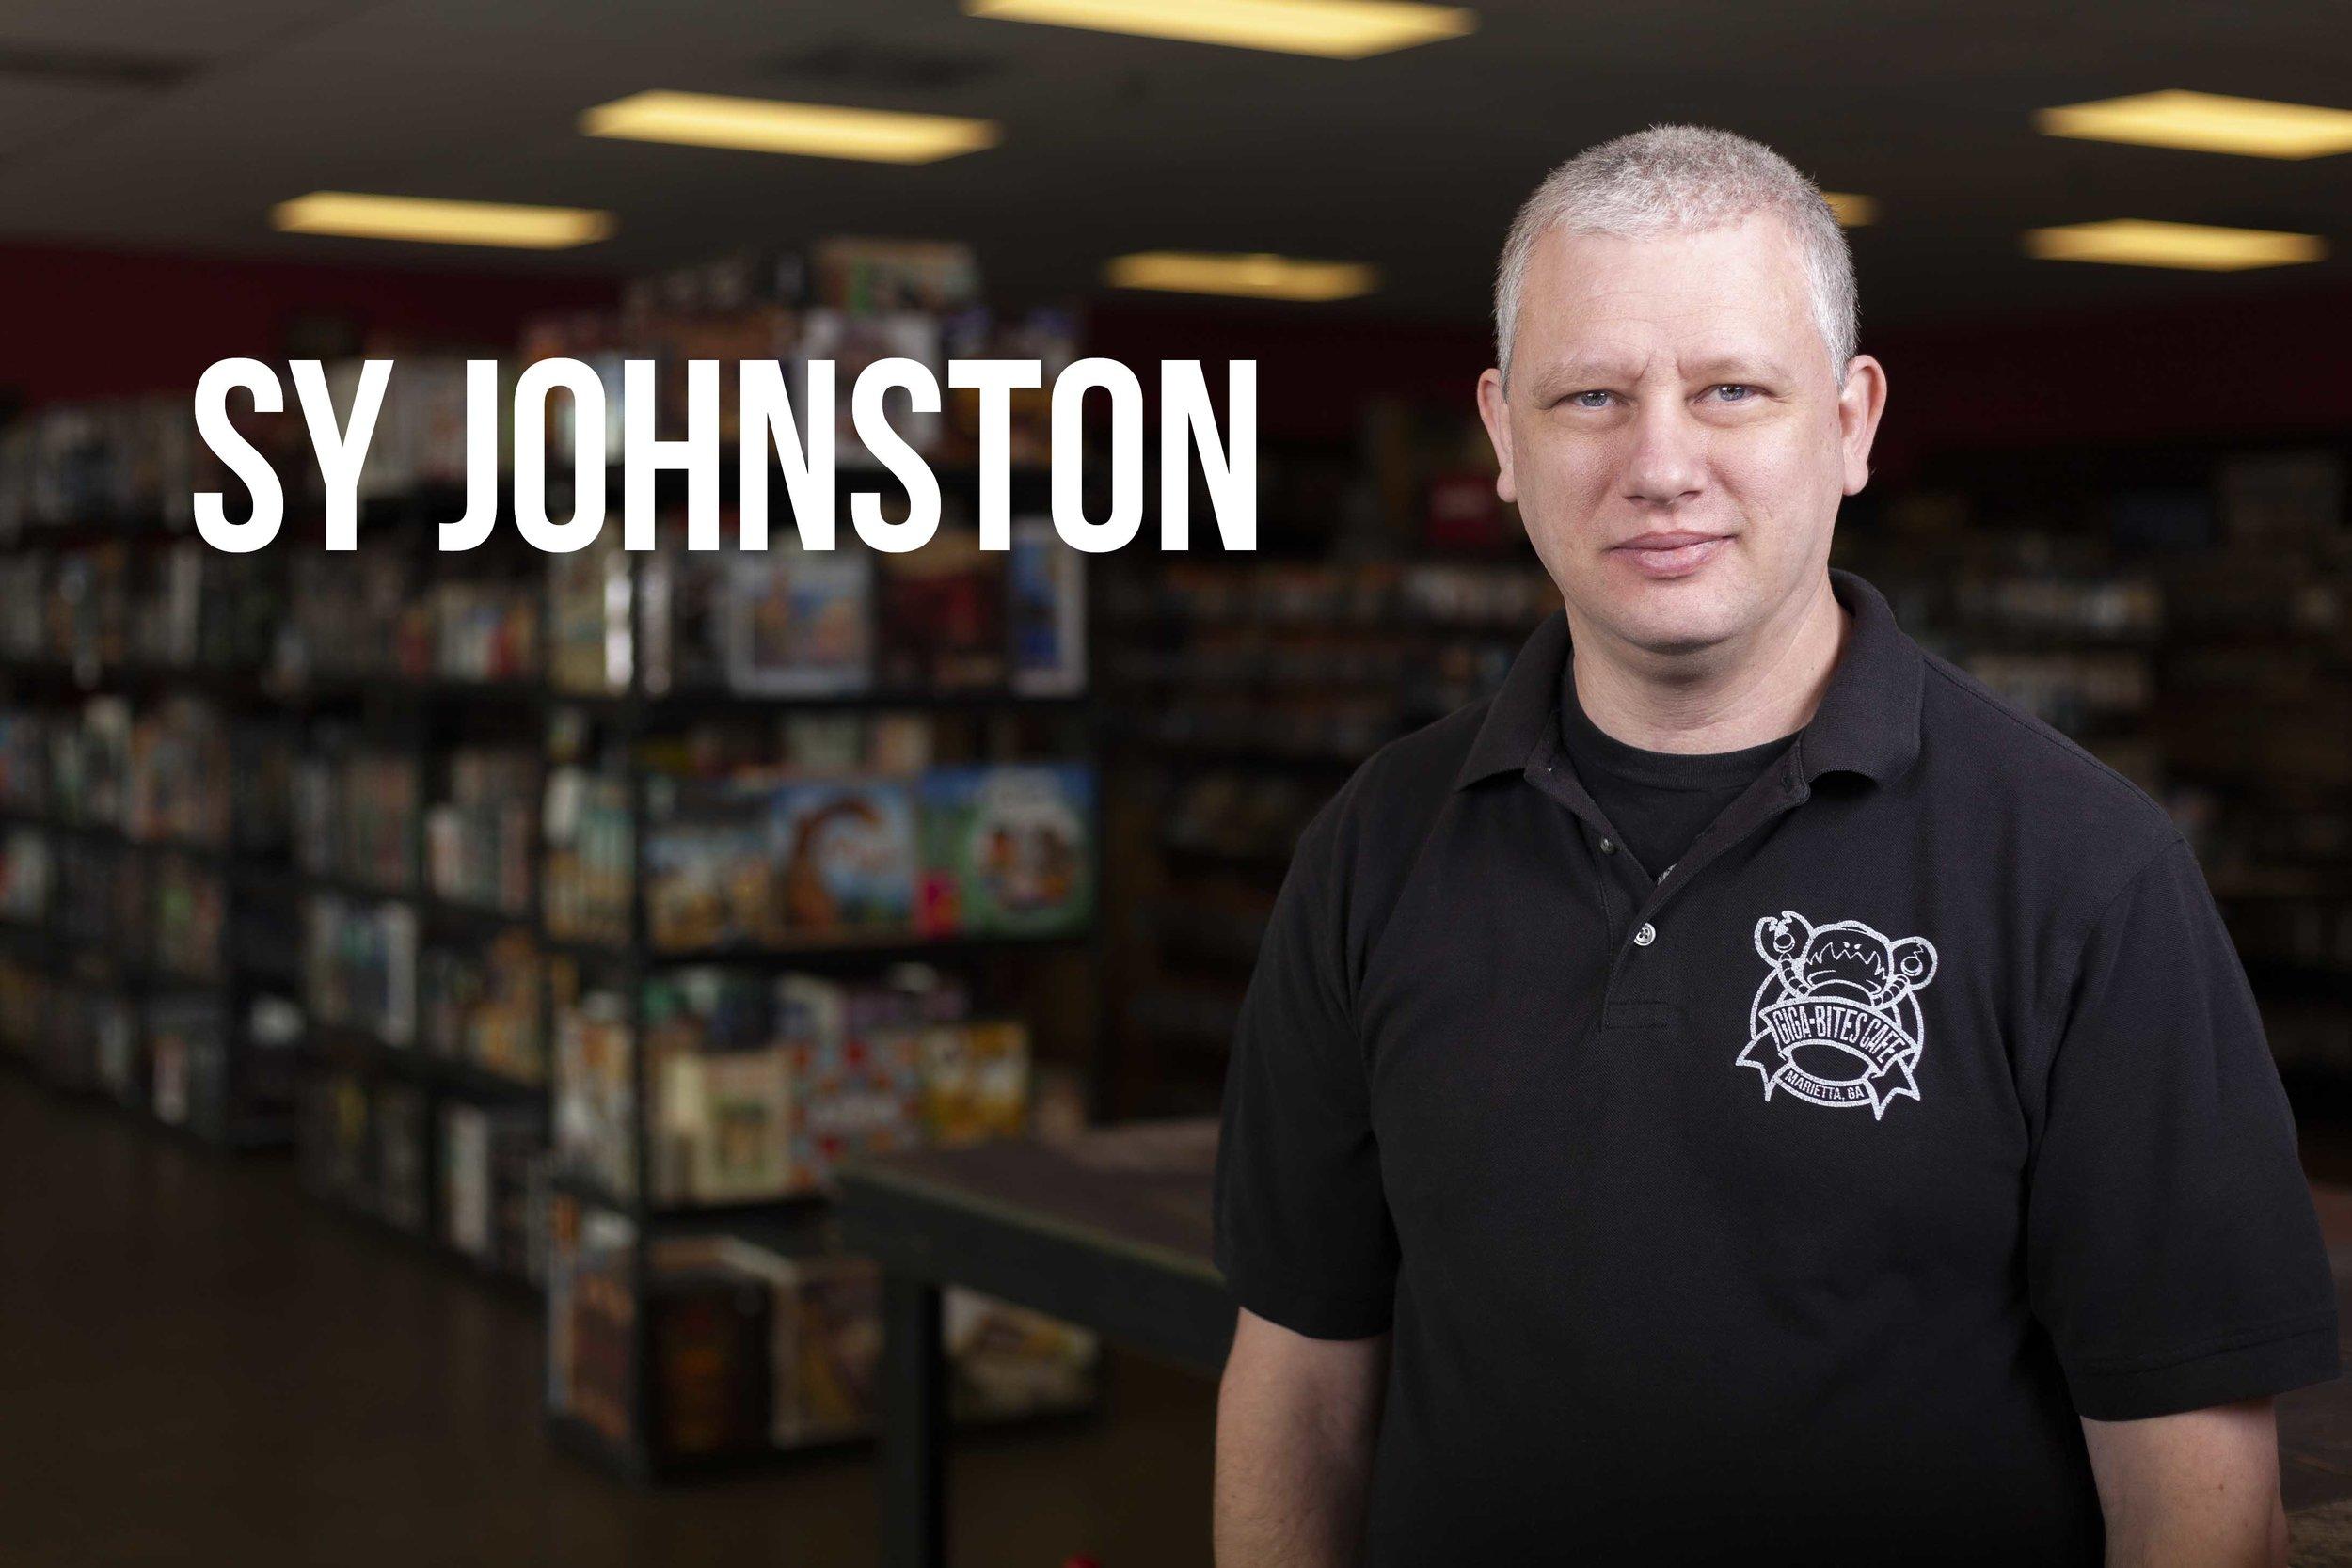 Sy Johnston Headshot.jpg